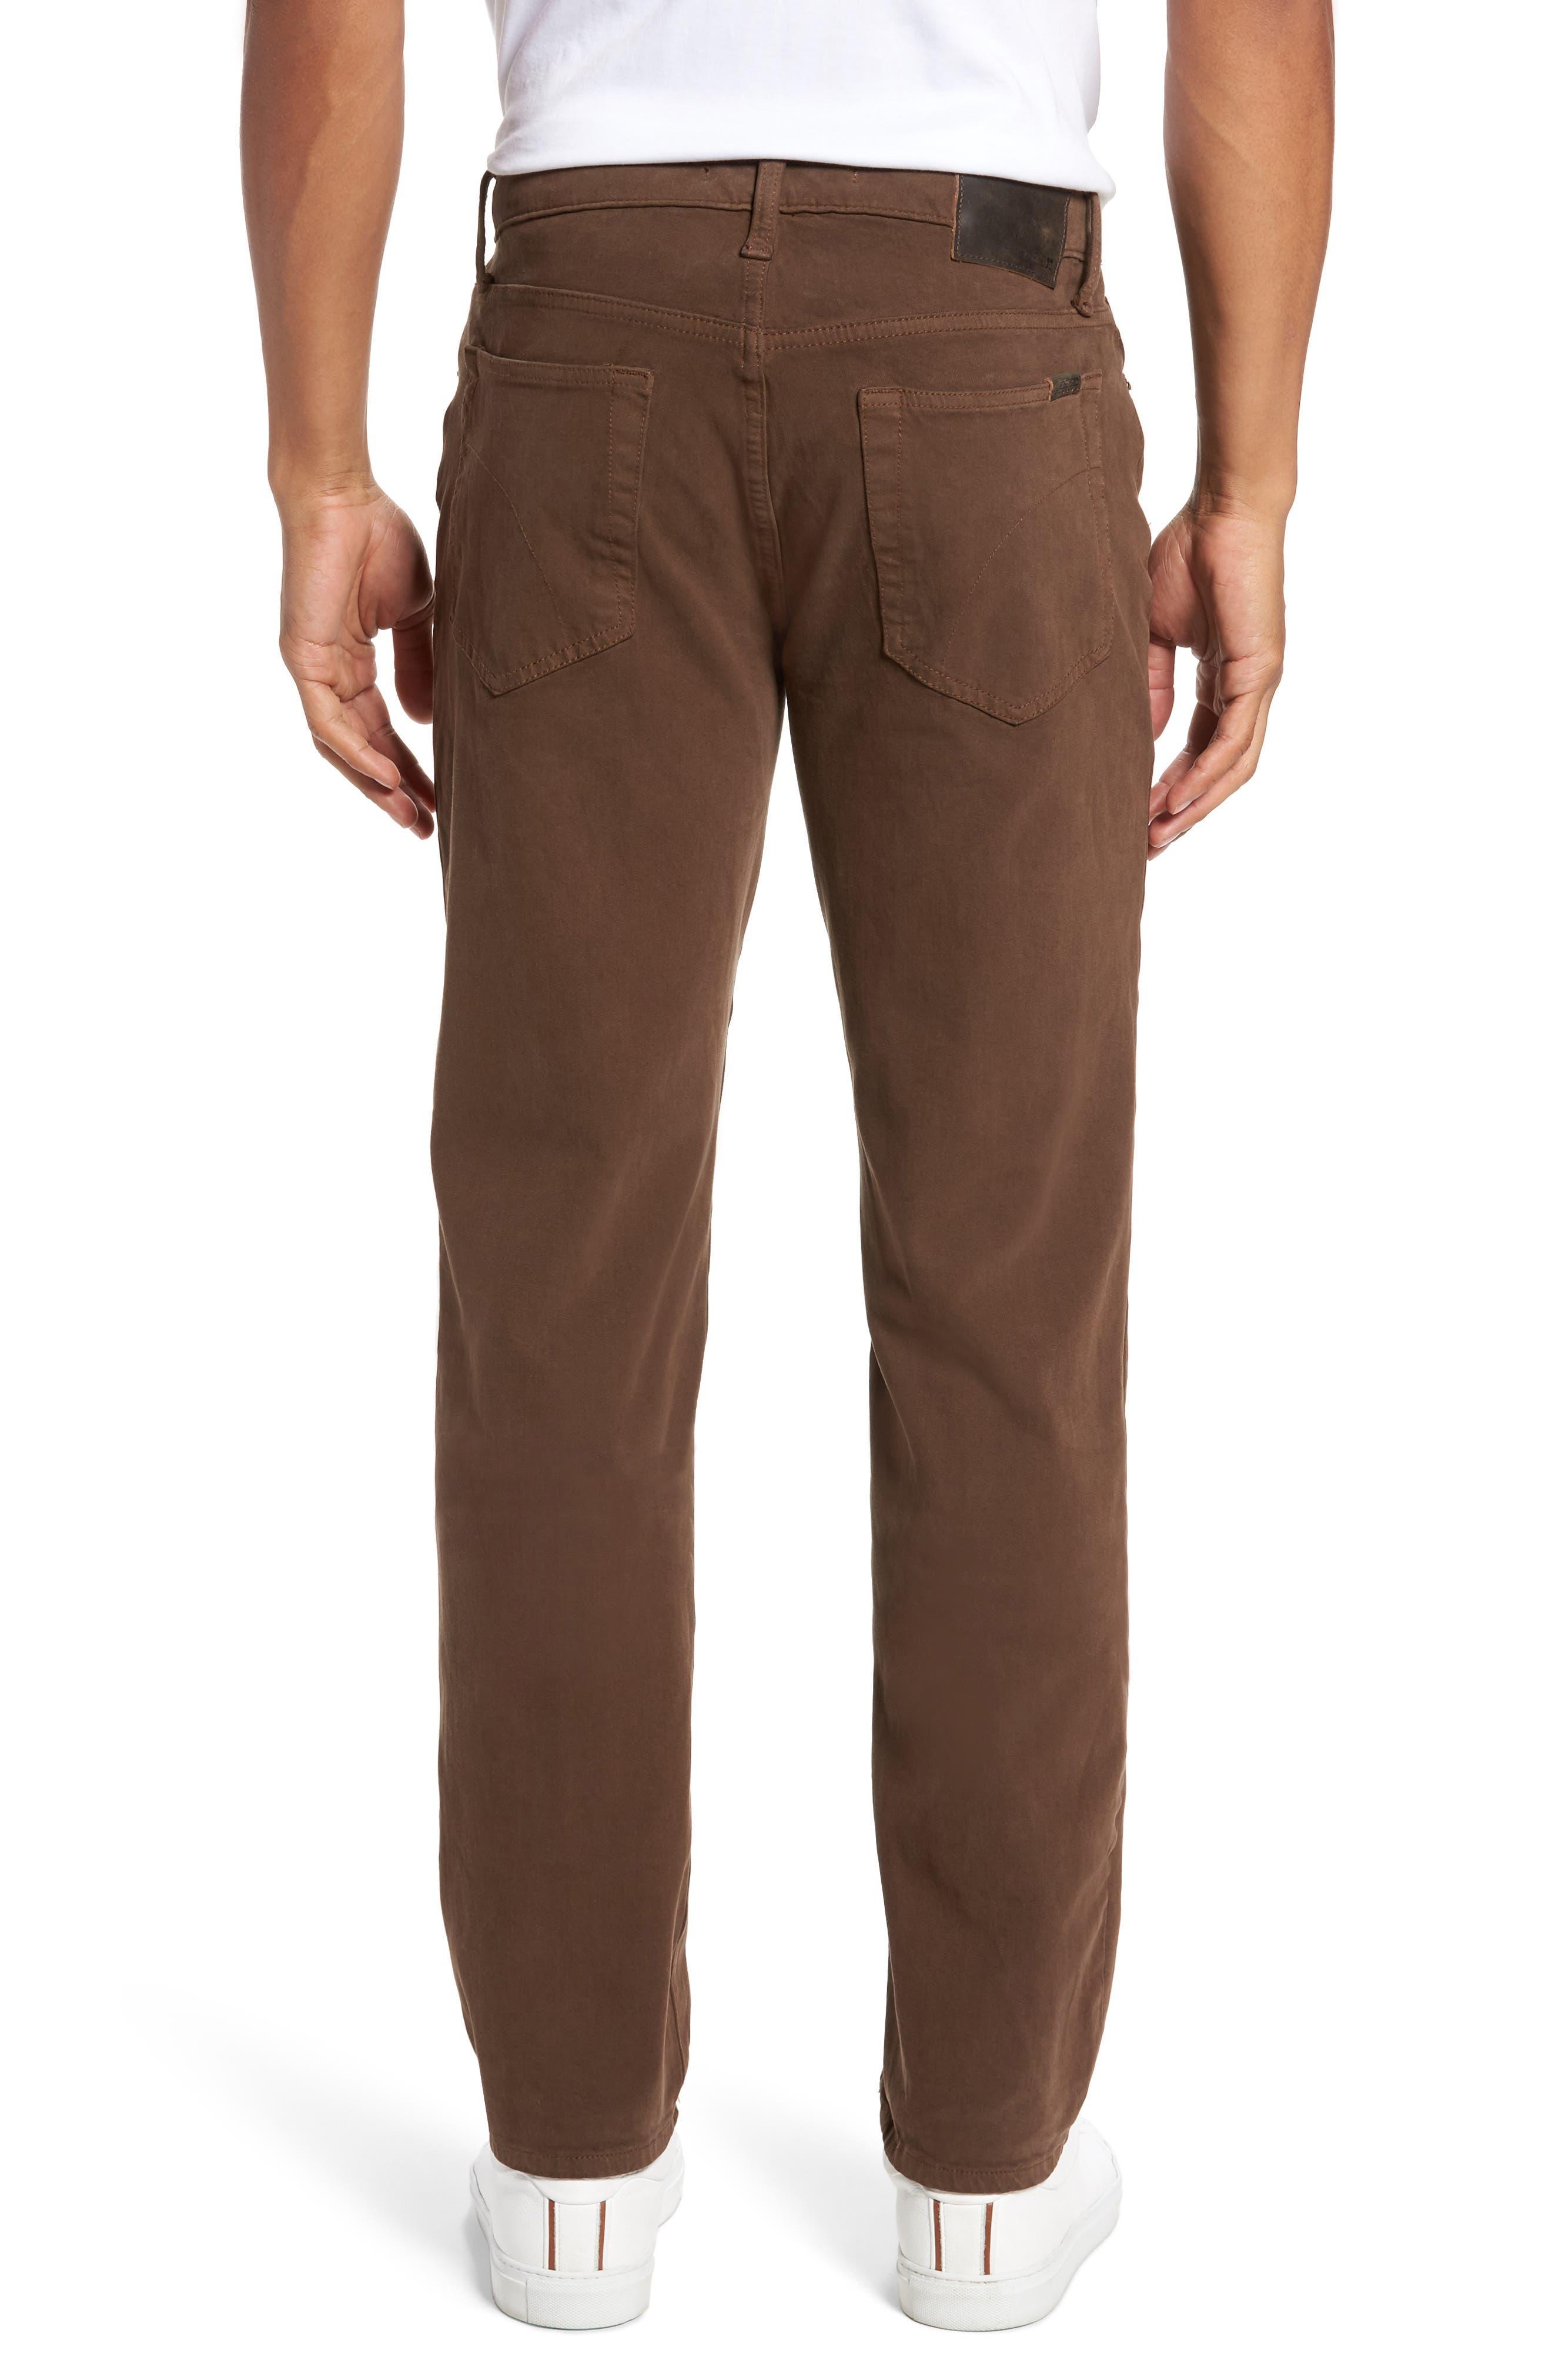 Alternate Image 2  - Joe's Brixton Slim Straight Fit Jeans (Dark Walnut)